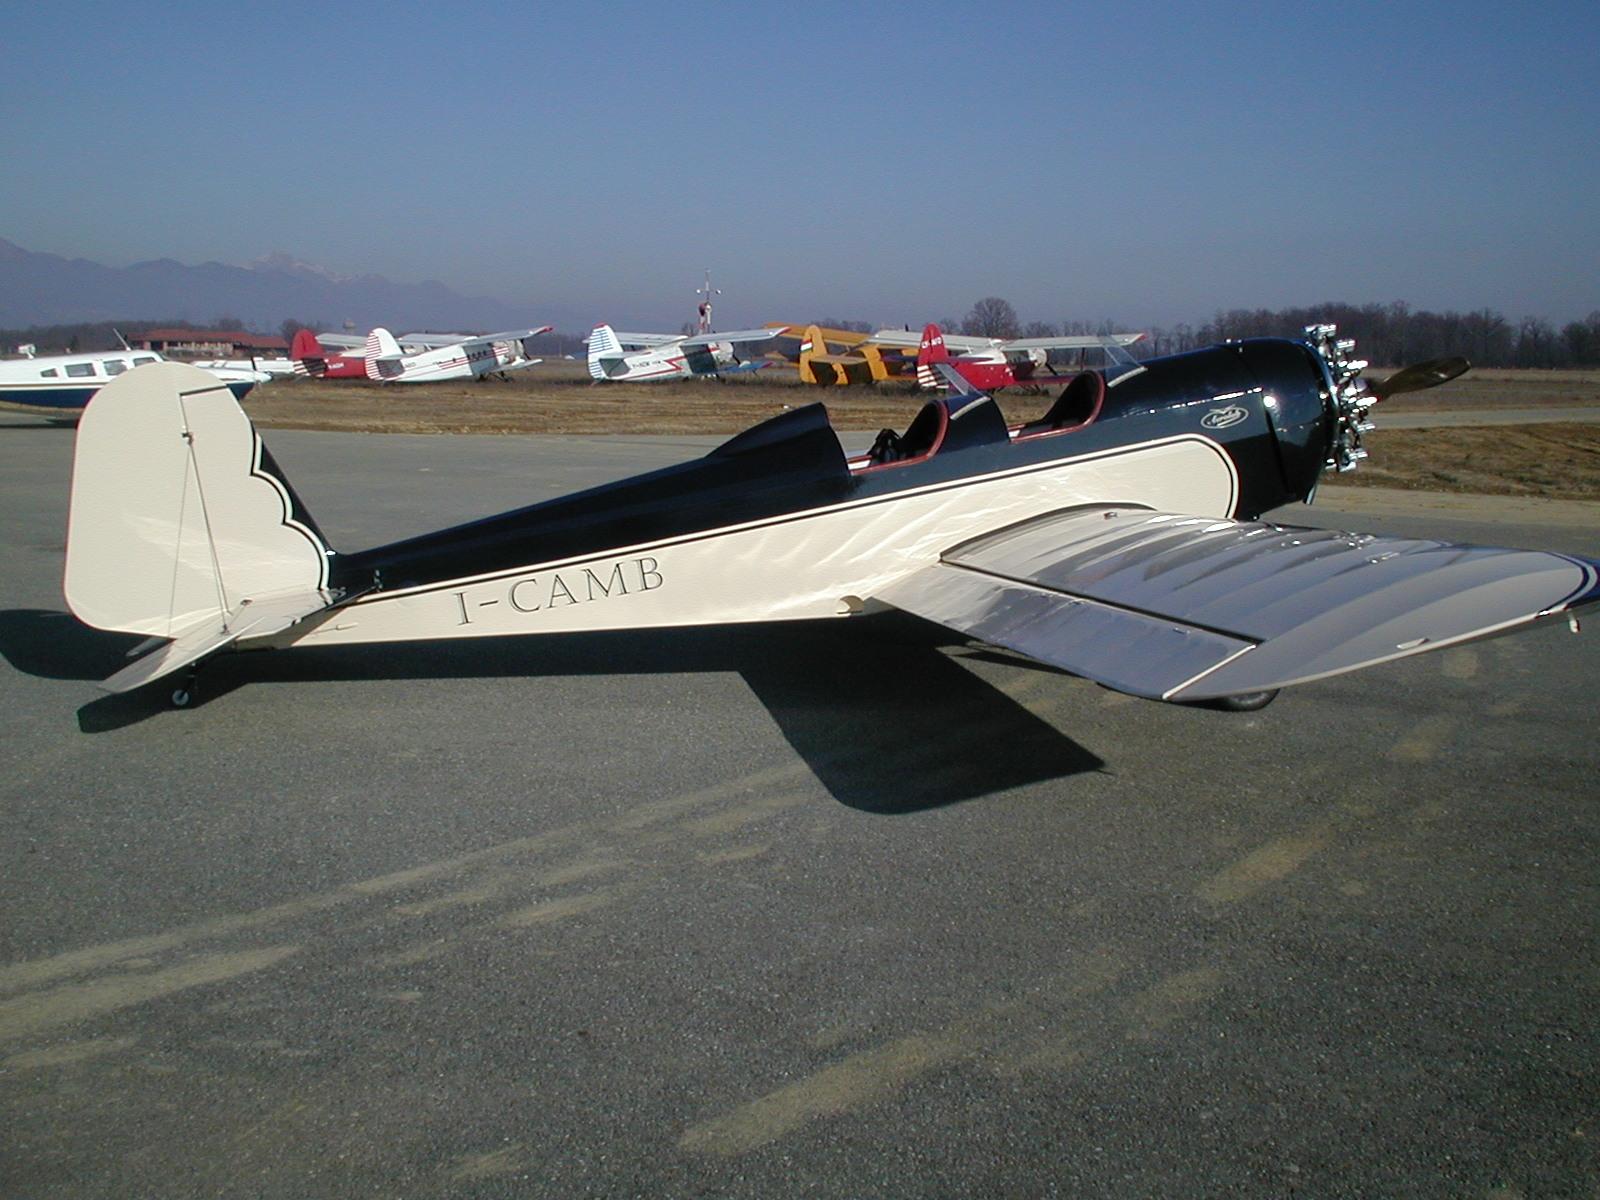 Aerolab2